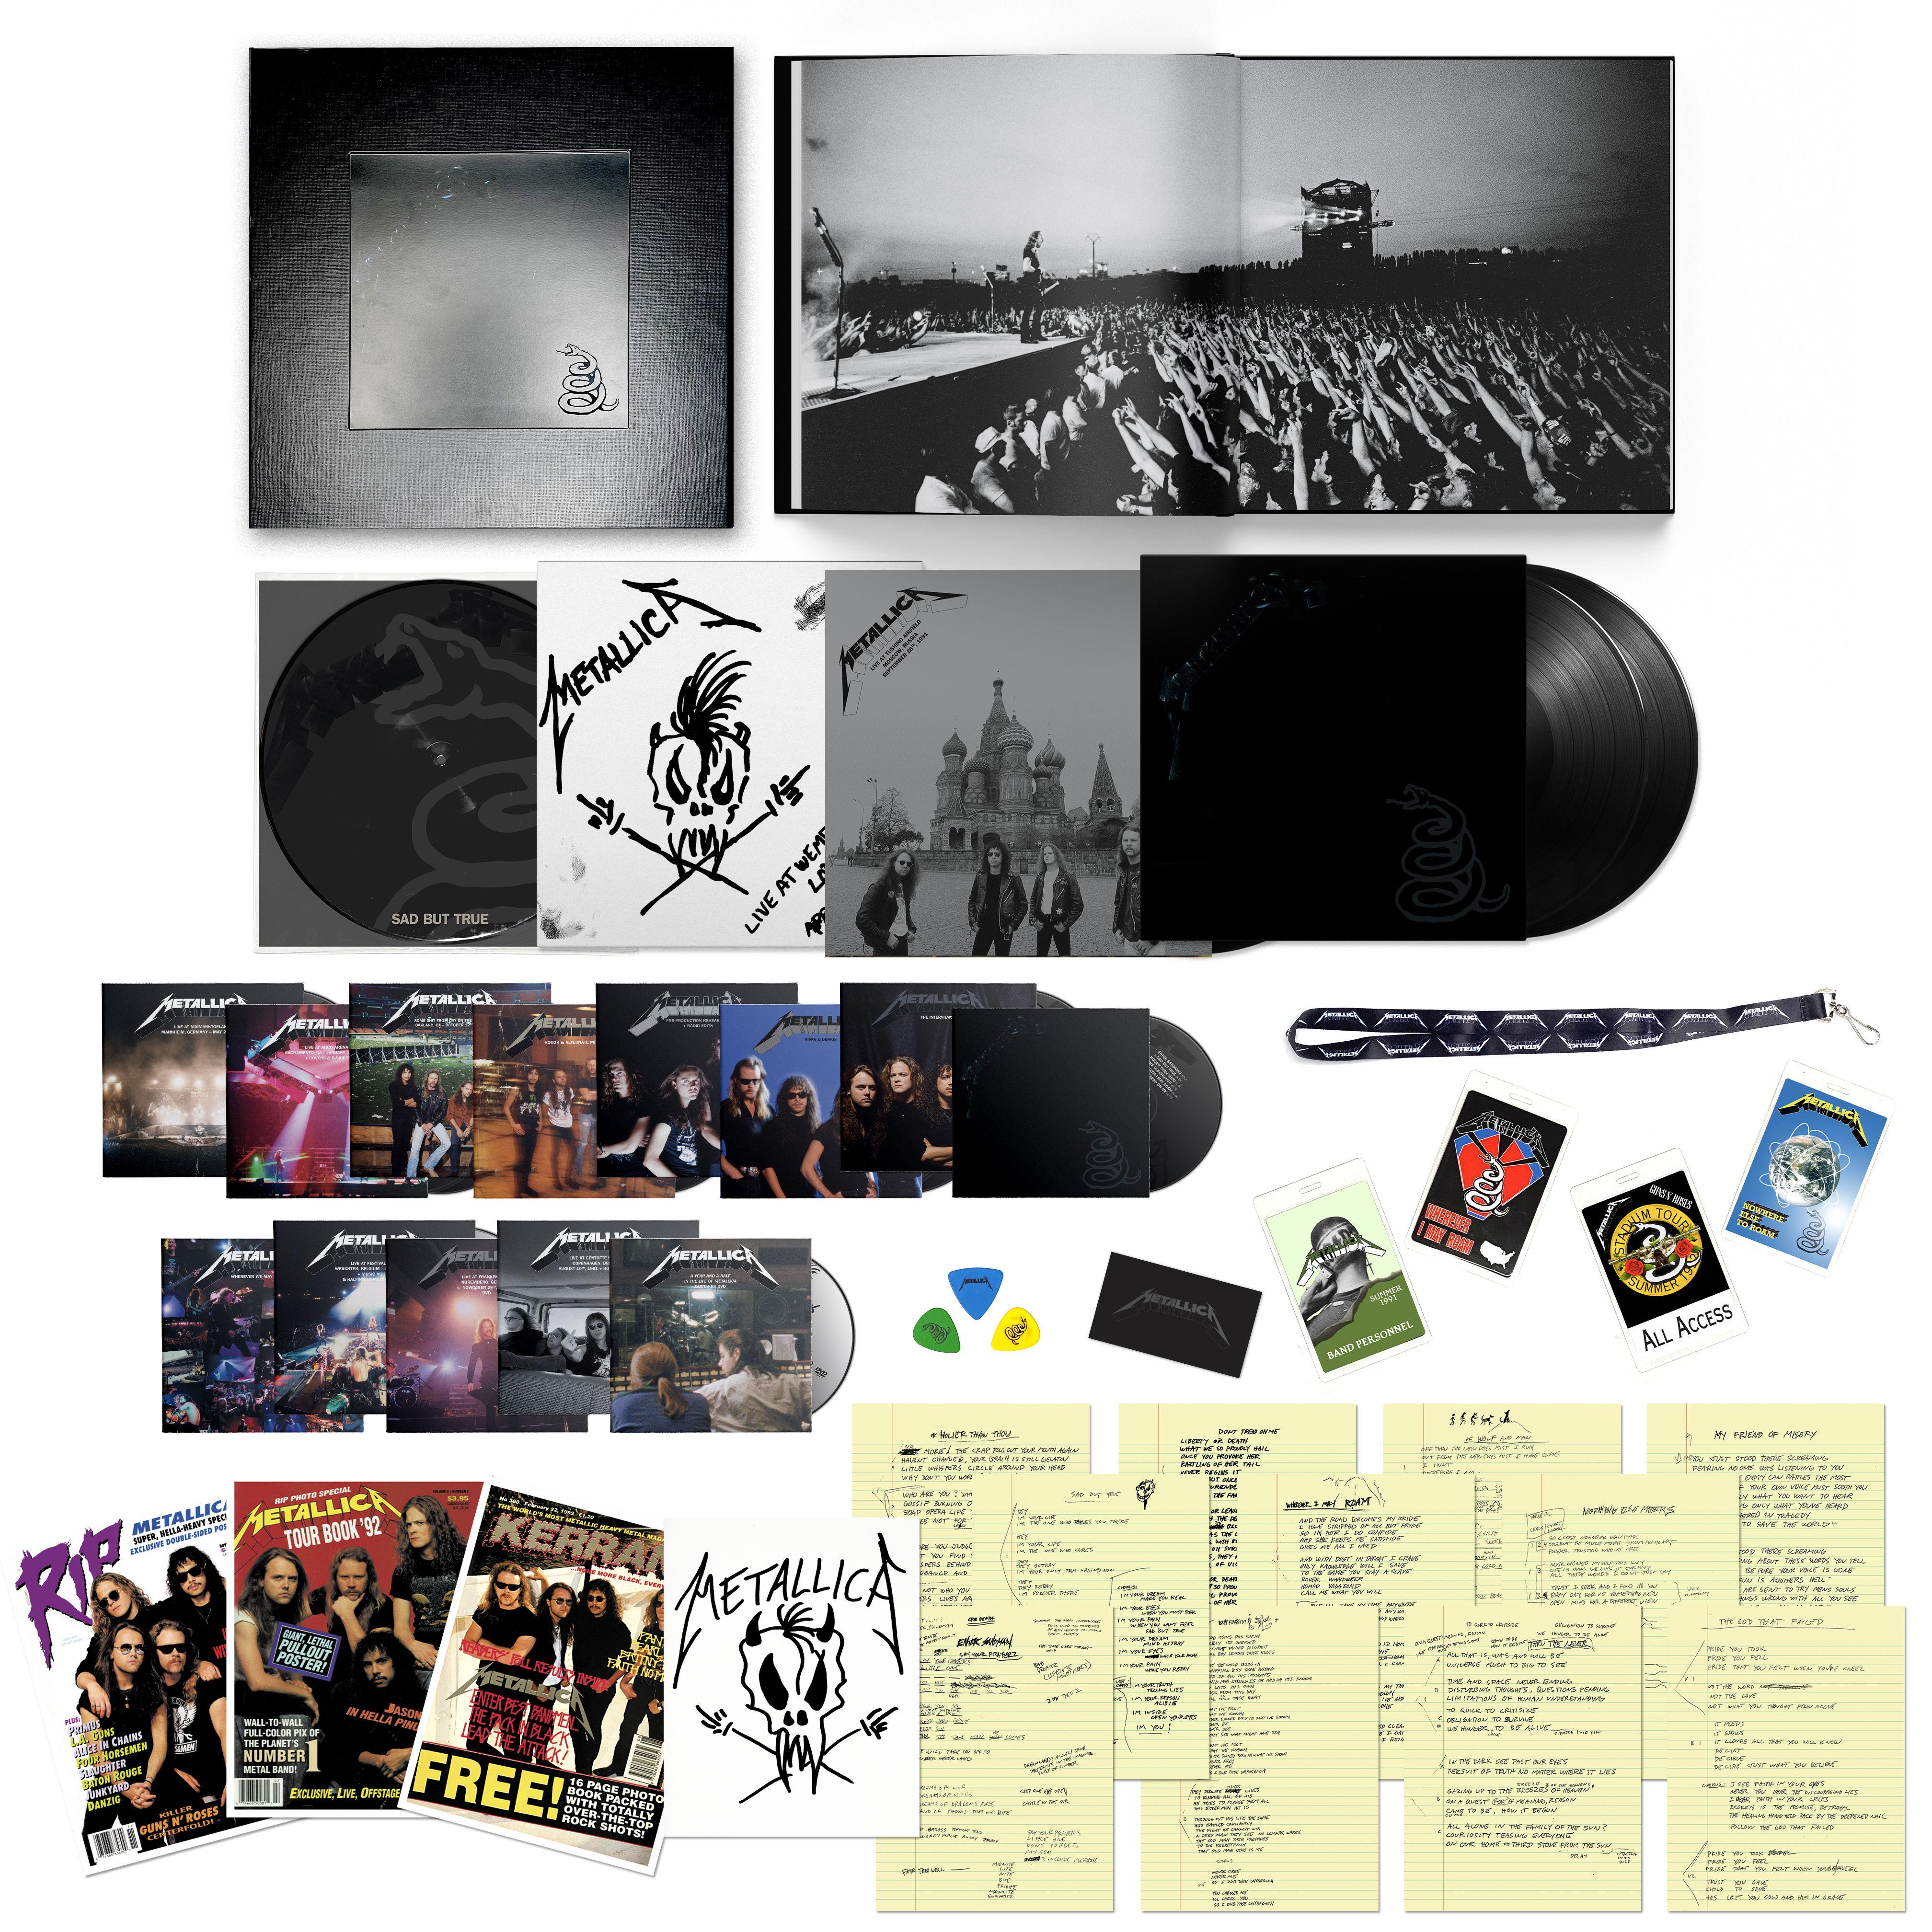 The Black Album (Remastered) Deluxe Box Set